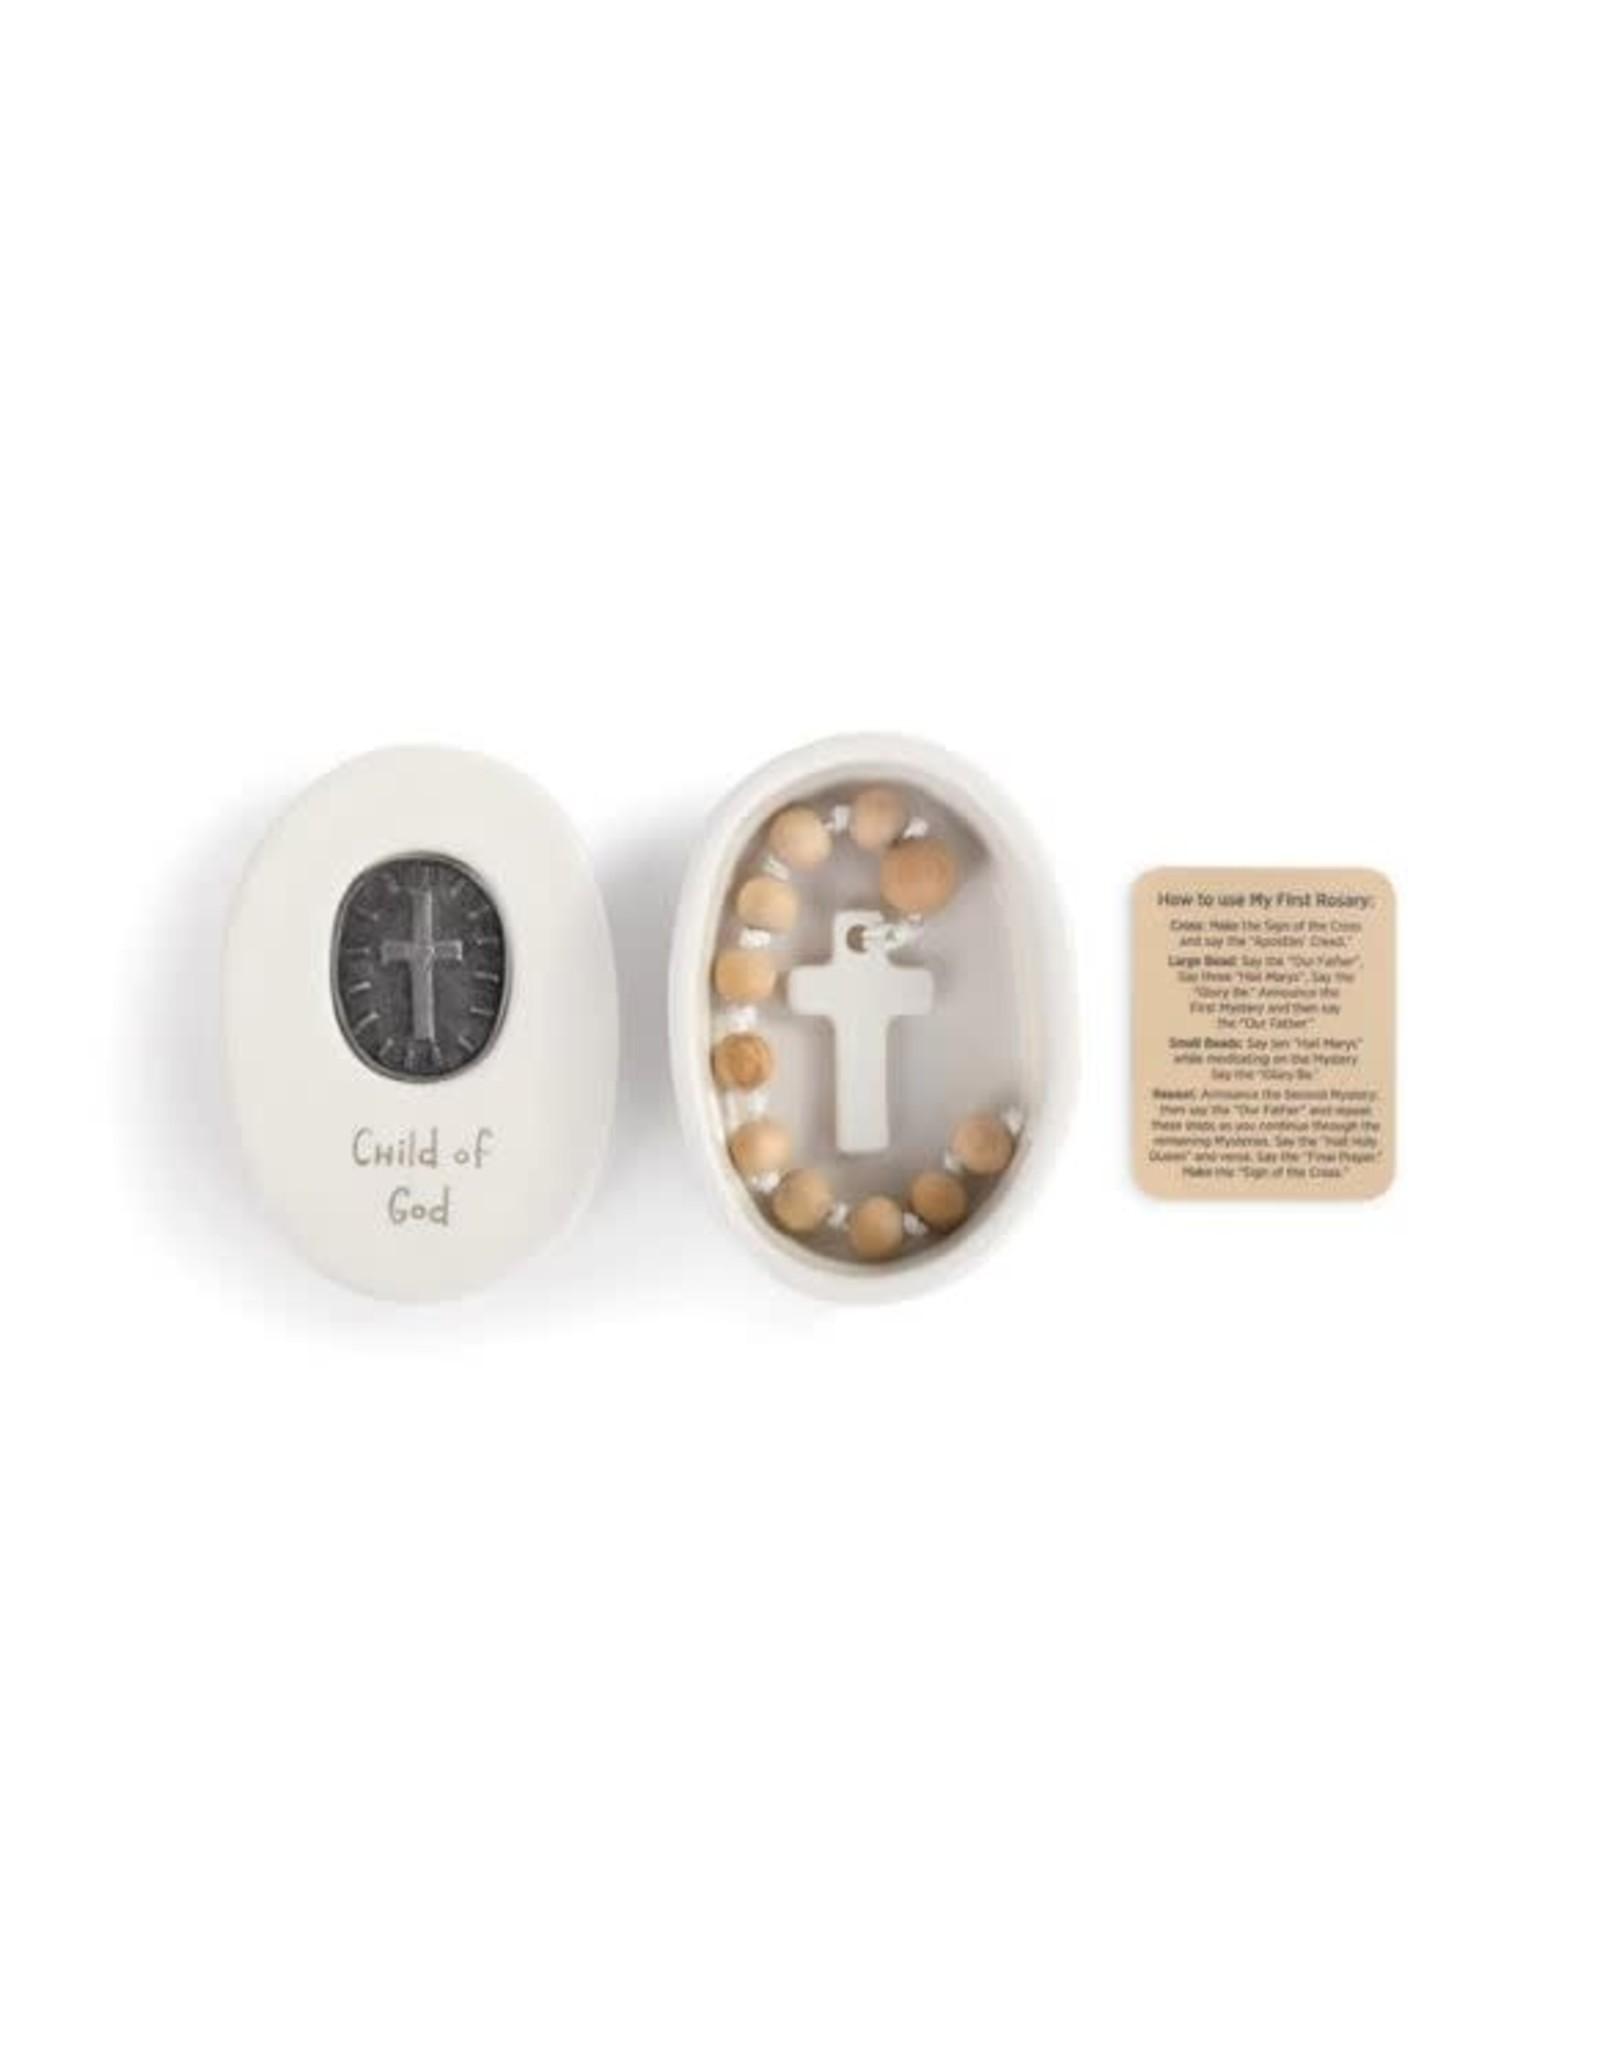 Demdaco CHILD OF GOD MEDALLION BOX WITH ROSARY